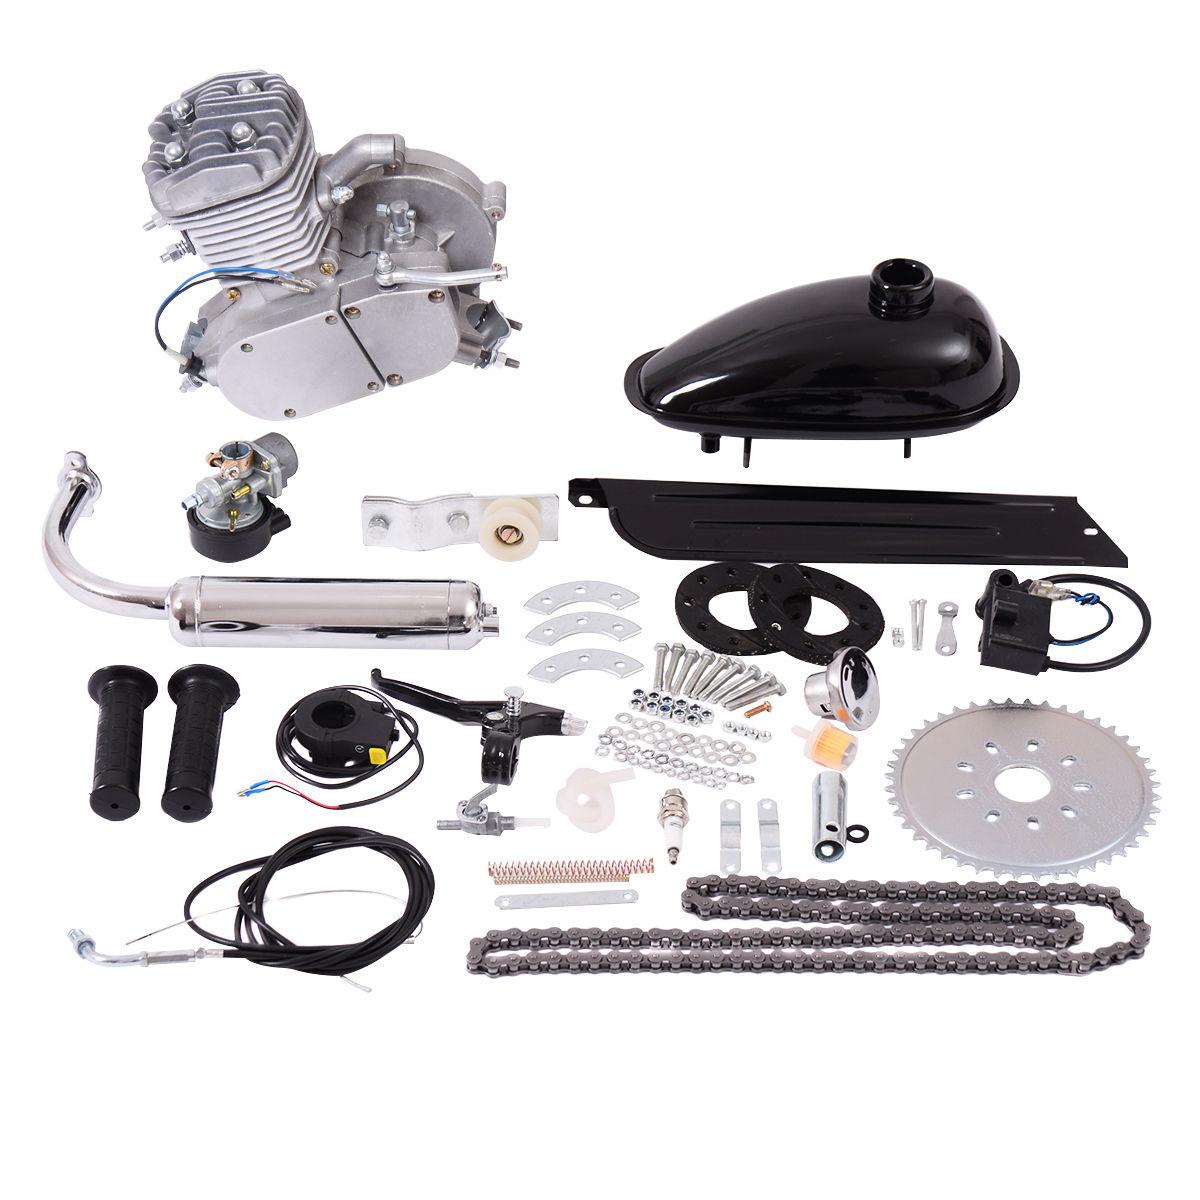 Bike Engine Kit 80cc 2-Takt Motorisierte Gas Moteur Fahrrad Benzin Hilfsmotor